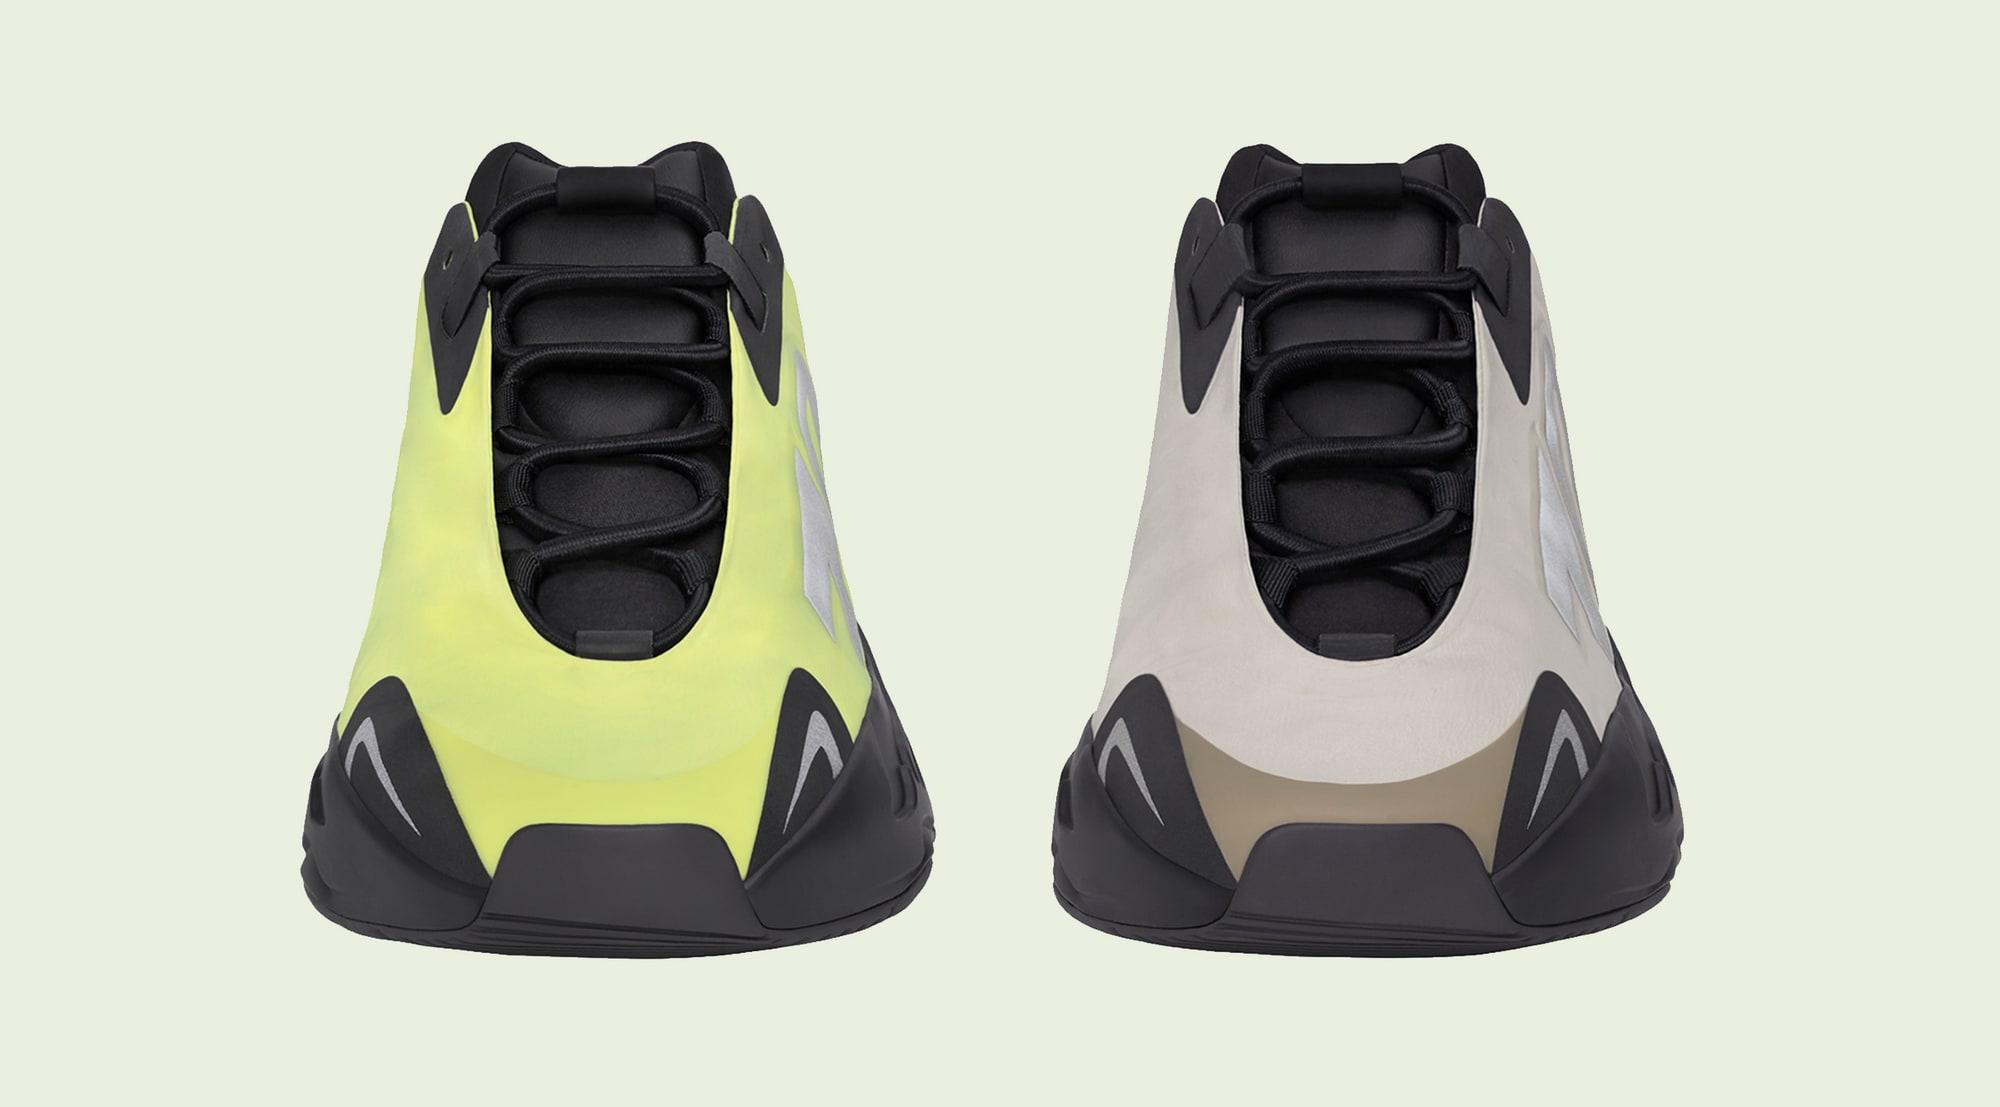 Adidas Yeezy Boost 700 MNVN 'Phosphor' 'Bone' Front